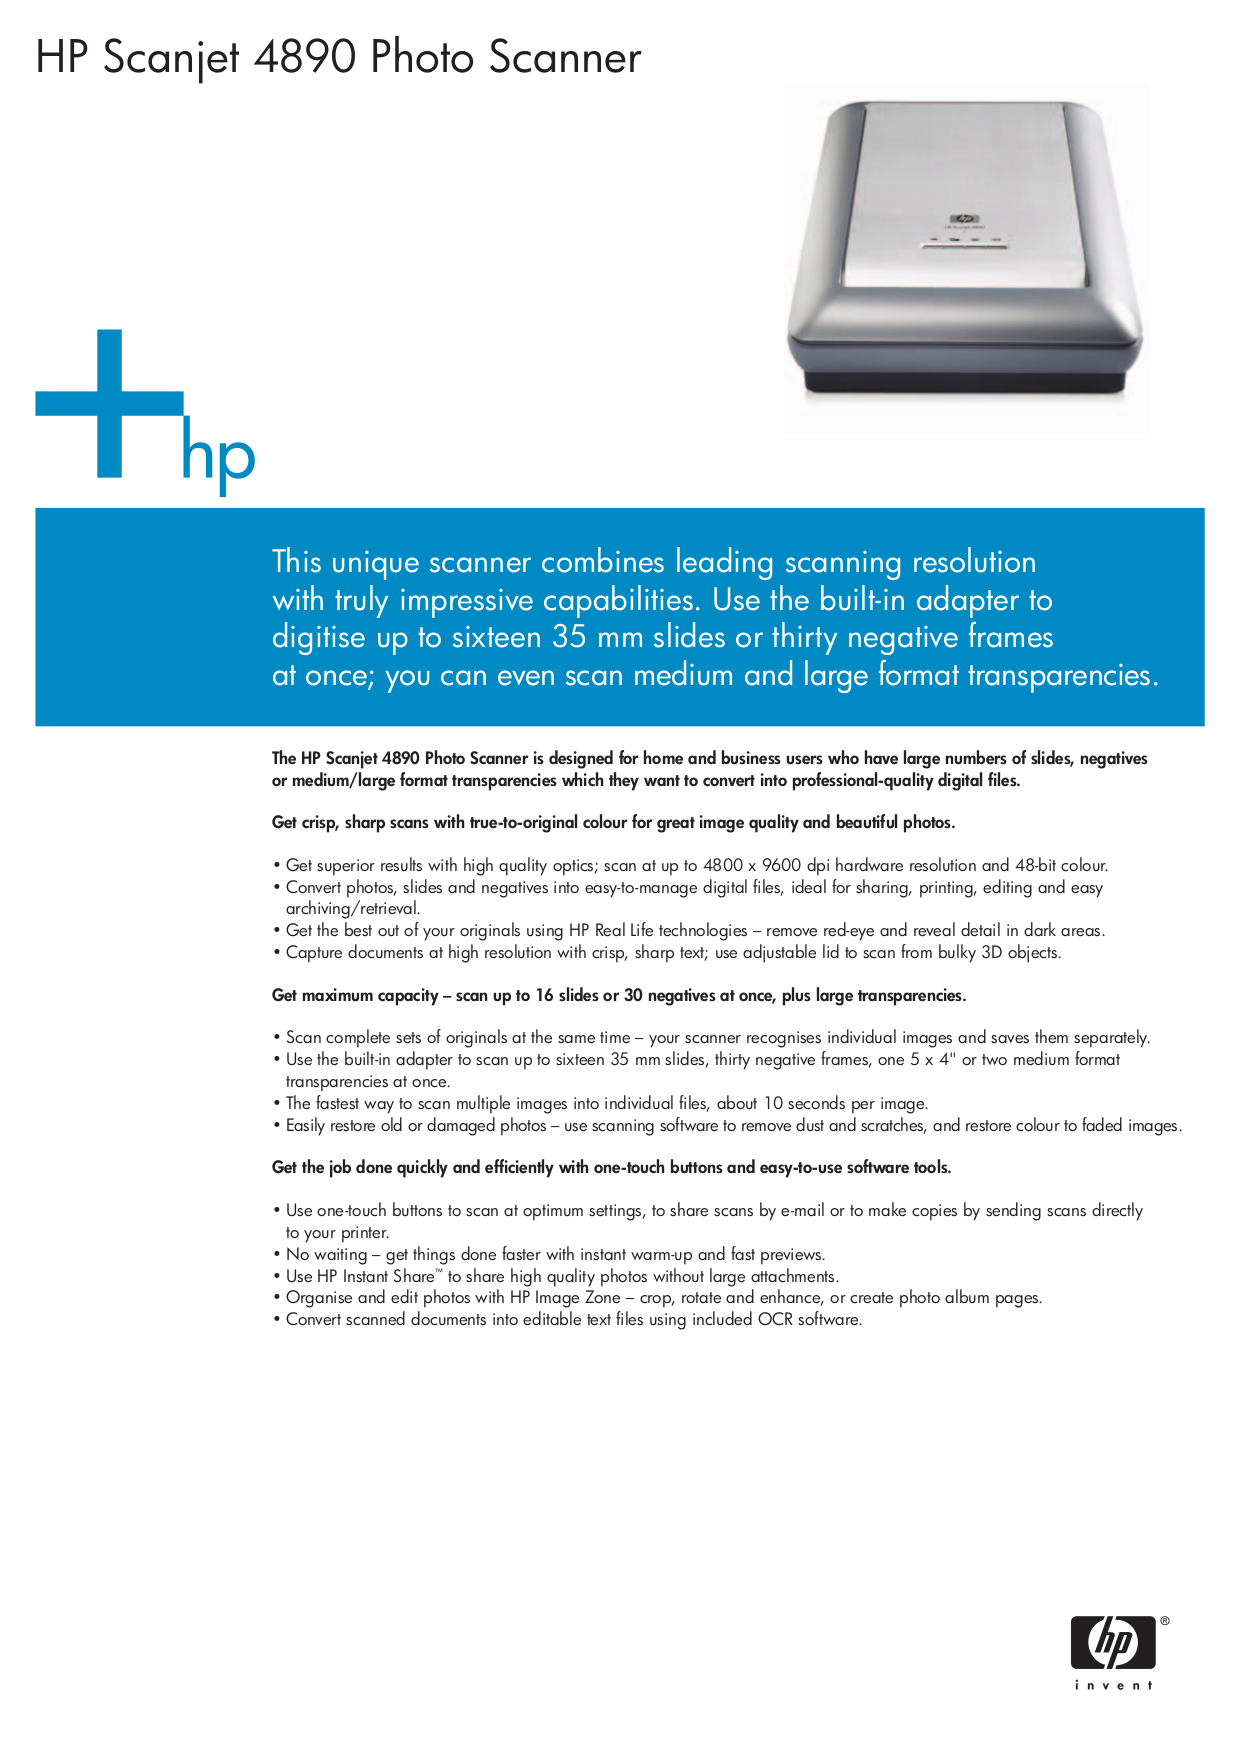 download free pdf for hp scanjet 4890 scanner manual rh umlib com HP Scanjet 5590 hp scanjet 4890 manual pdf